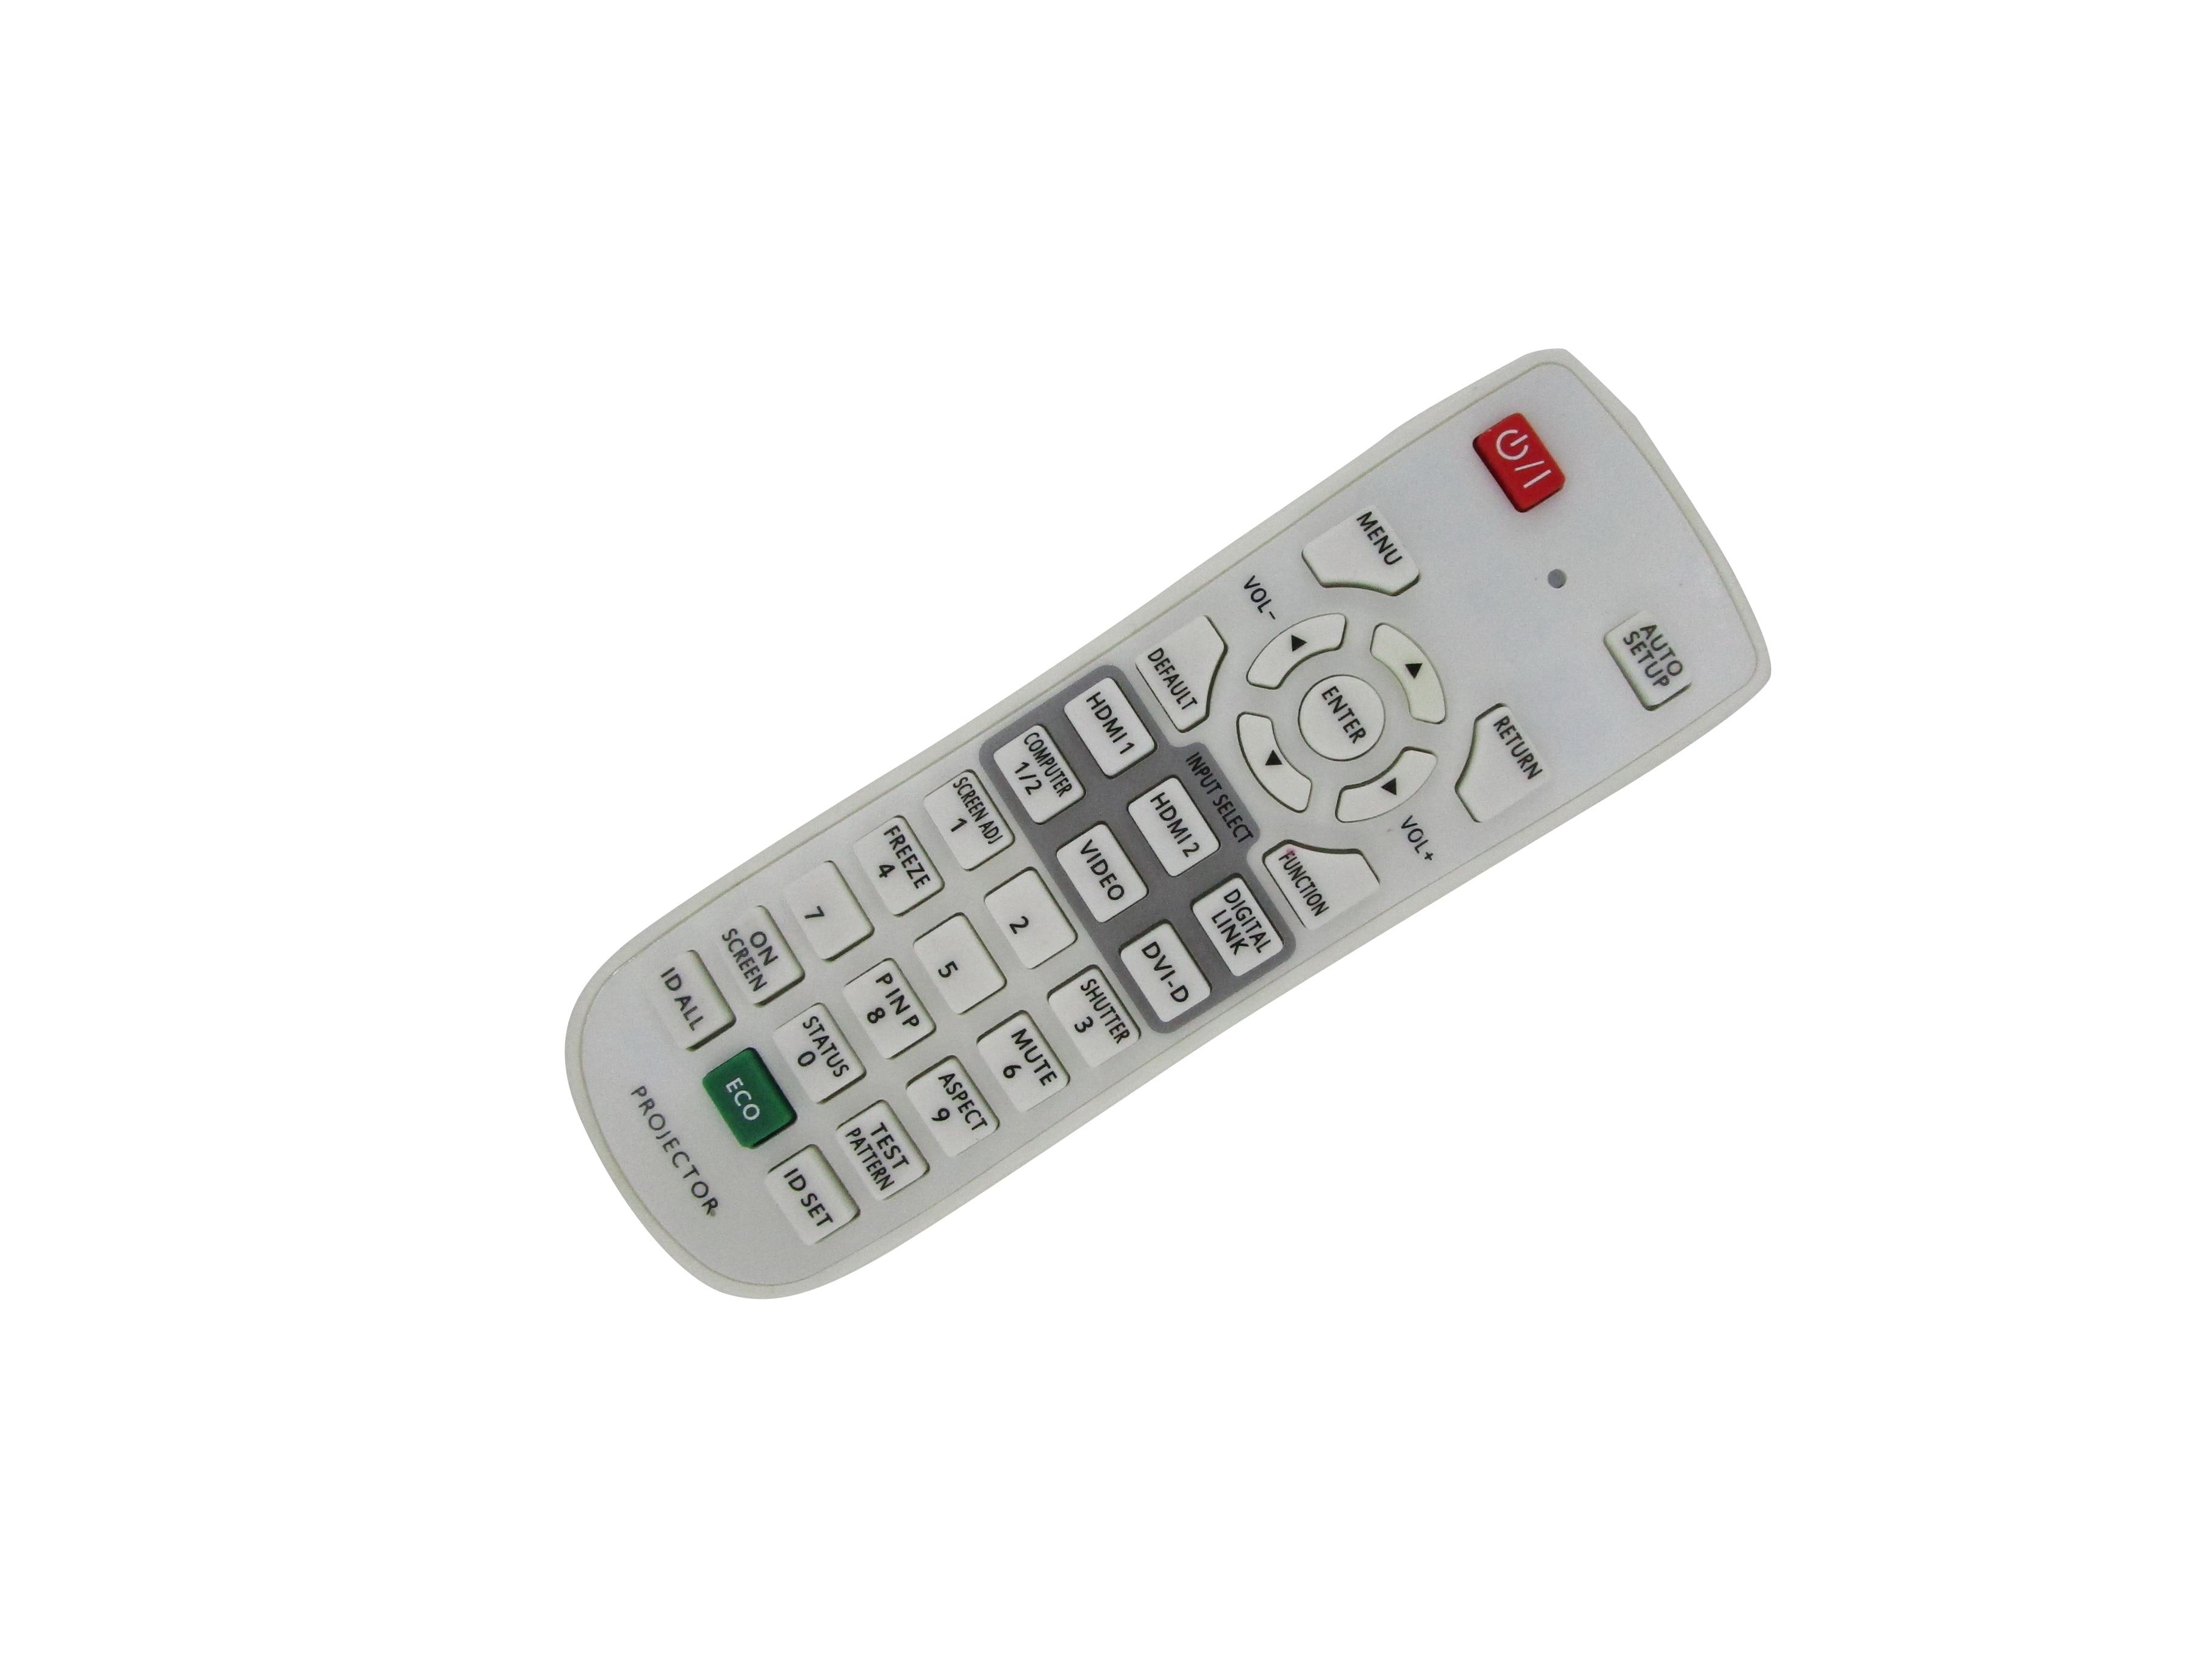 Control remoto para Panasonic PT-EZ590L PT-EX620U PT-EX620UL PT-EZ590U PT-EZ590UL PT-FZ570U PT-FW530U PT-FX500U 3LCD para proyector